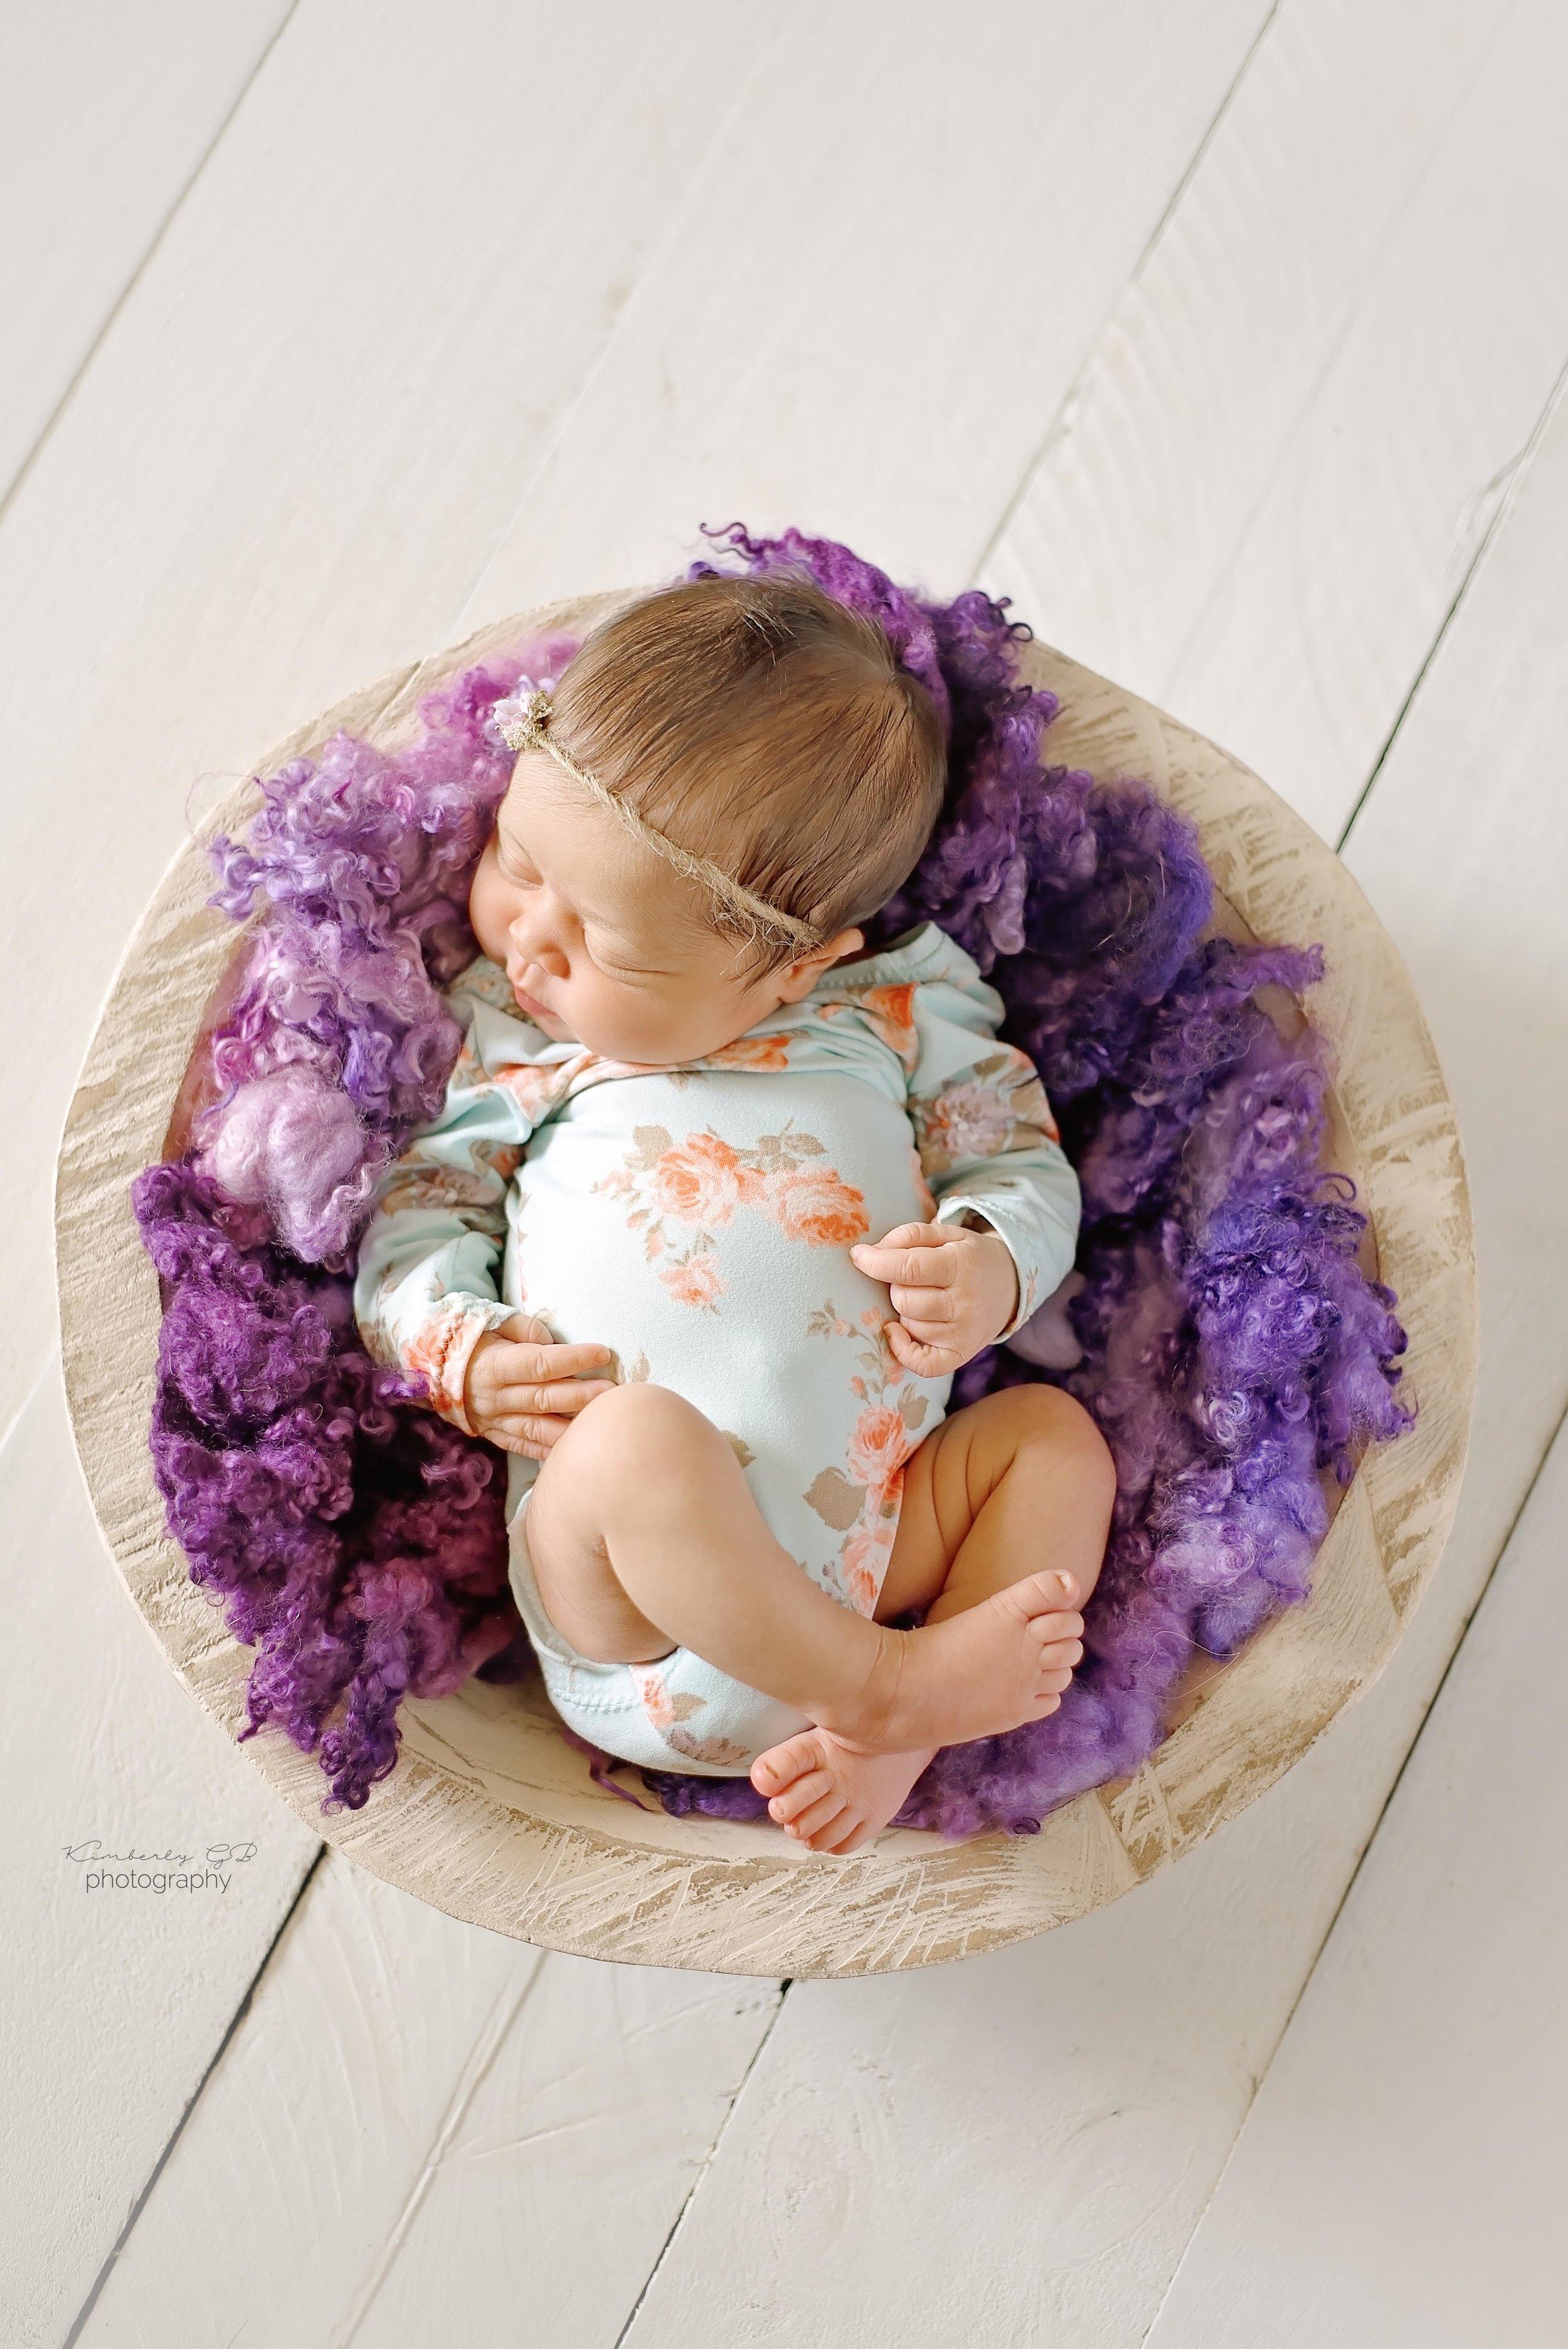 fotografia-de-recien-nacidos-bebes-newborn-en-puerto-rico-kimberly-gb-photography-fotografa-94.jpg